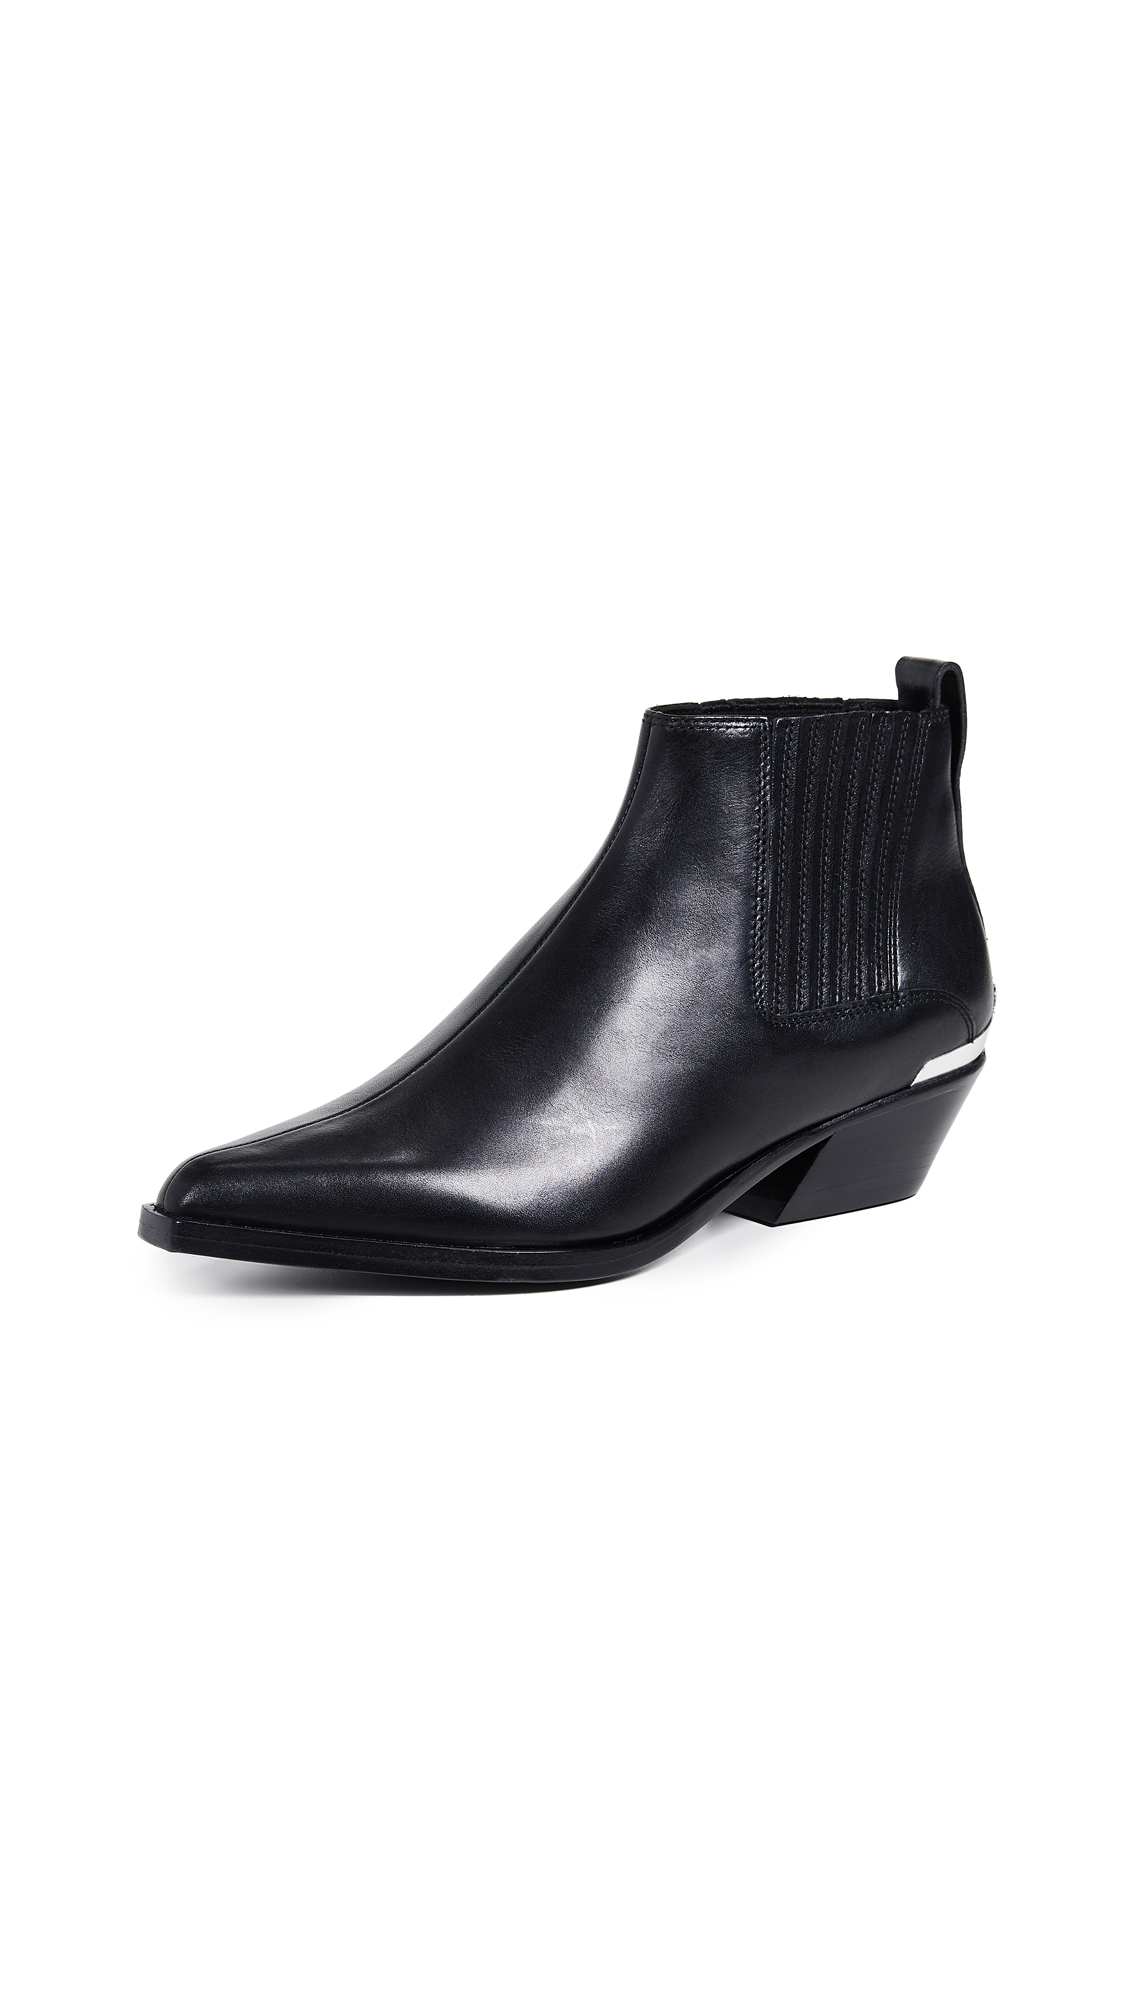 Rag & Bone Westin Boots - Black